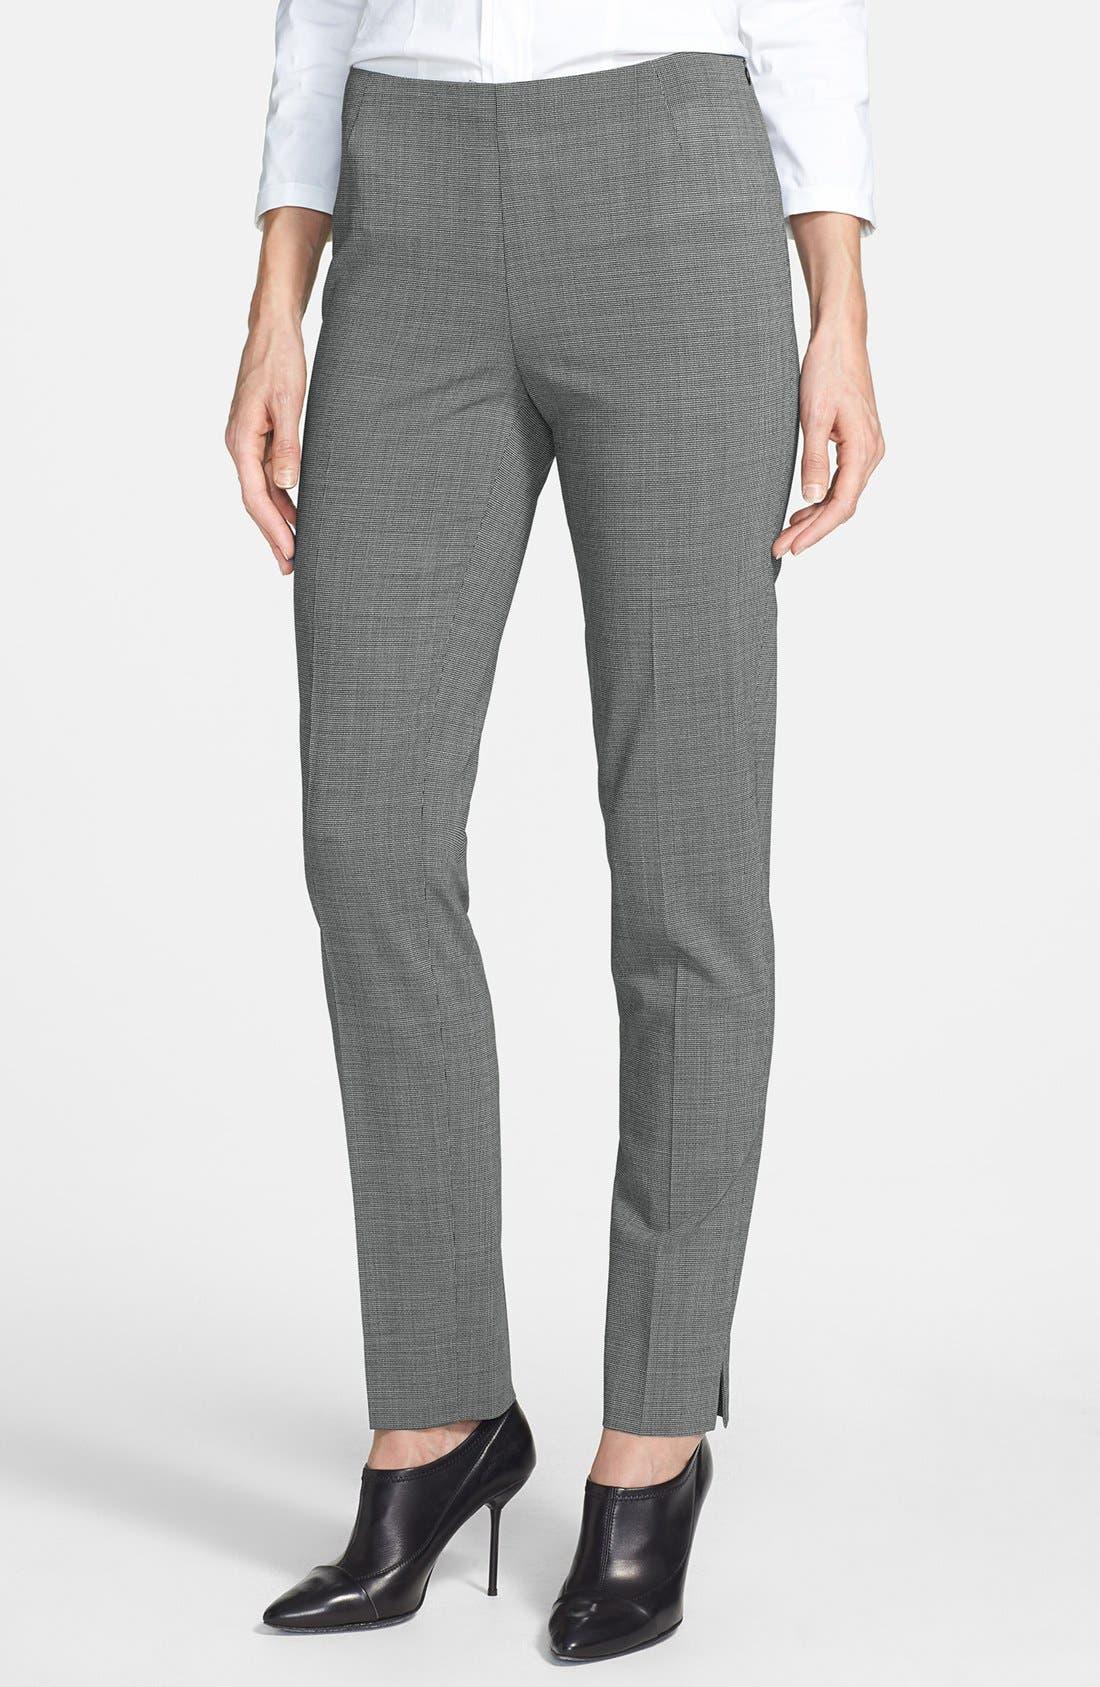 Main Image - Lafayette 148 New York 'Chrystie' Stretch Wool Pants